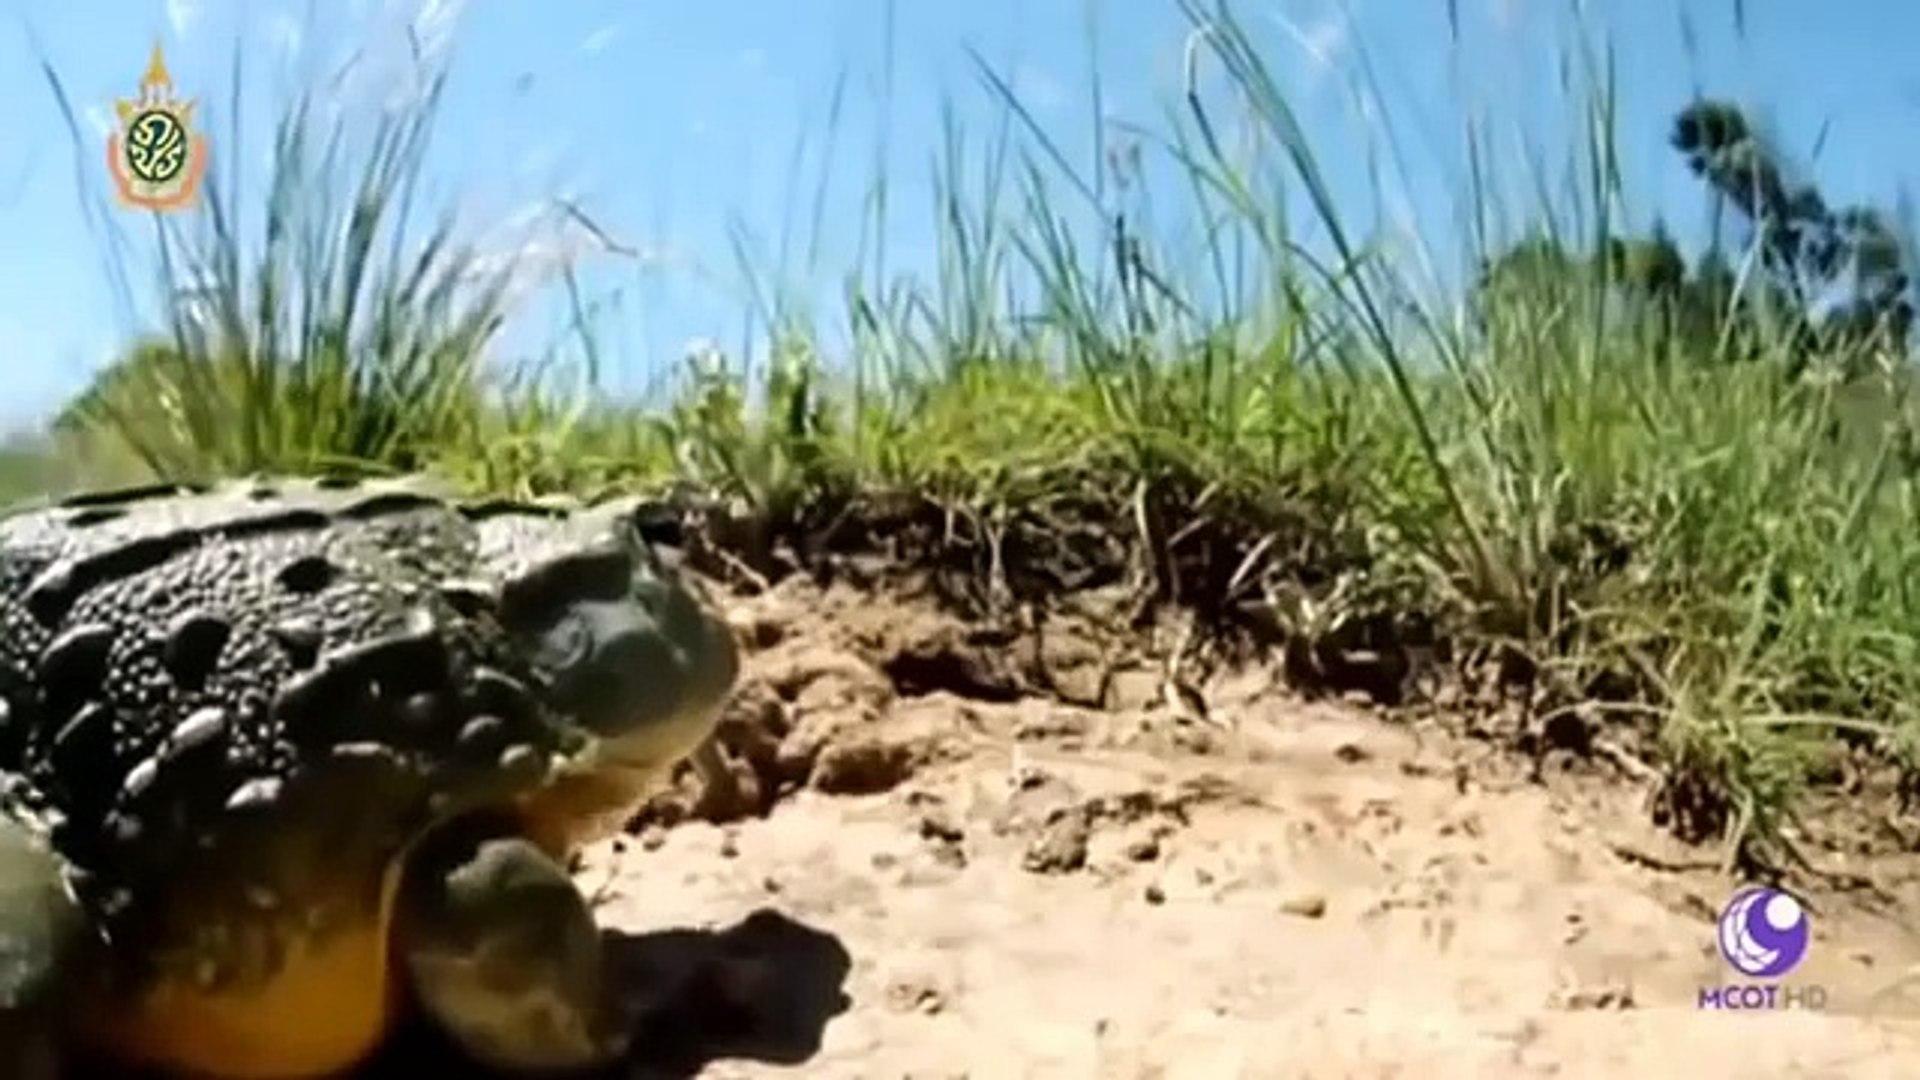 BBC Animals Documentary 2018, Amazing Giant Frog, Discovery Wild Animals